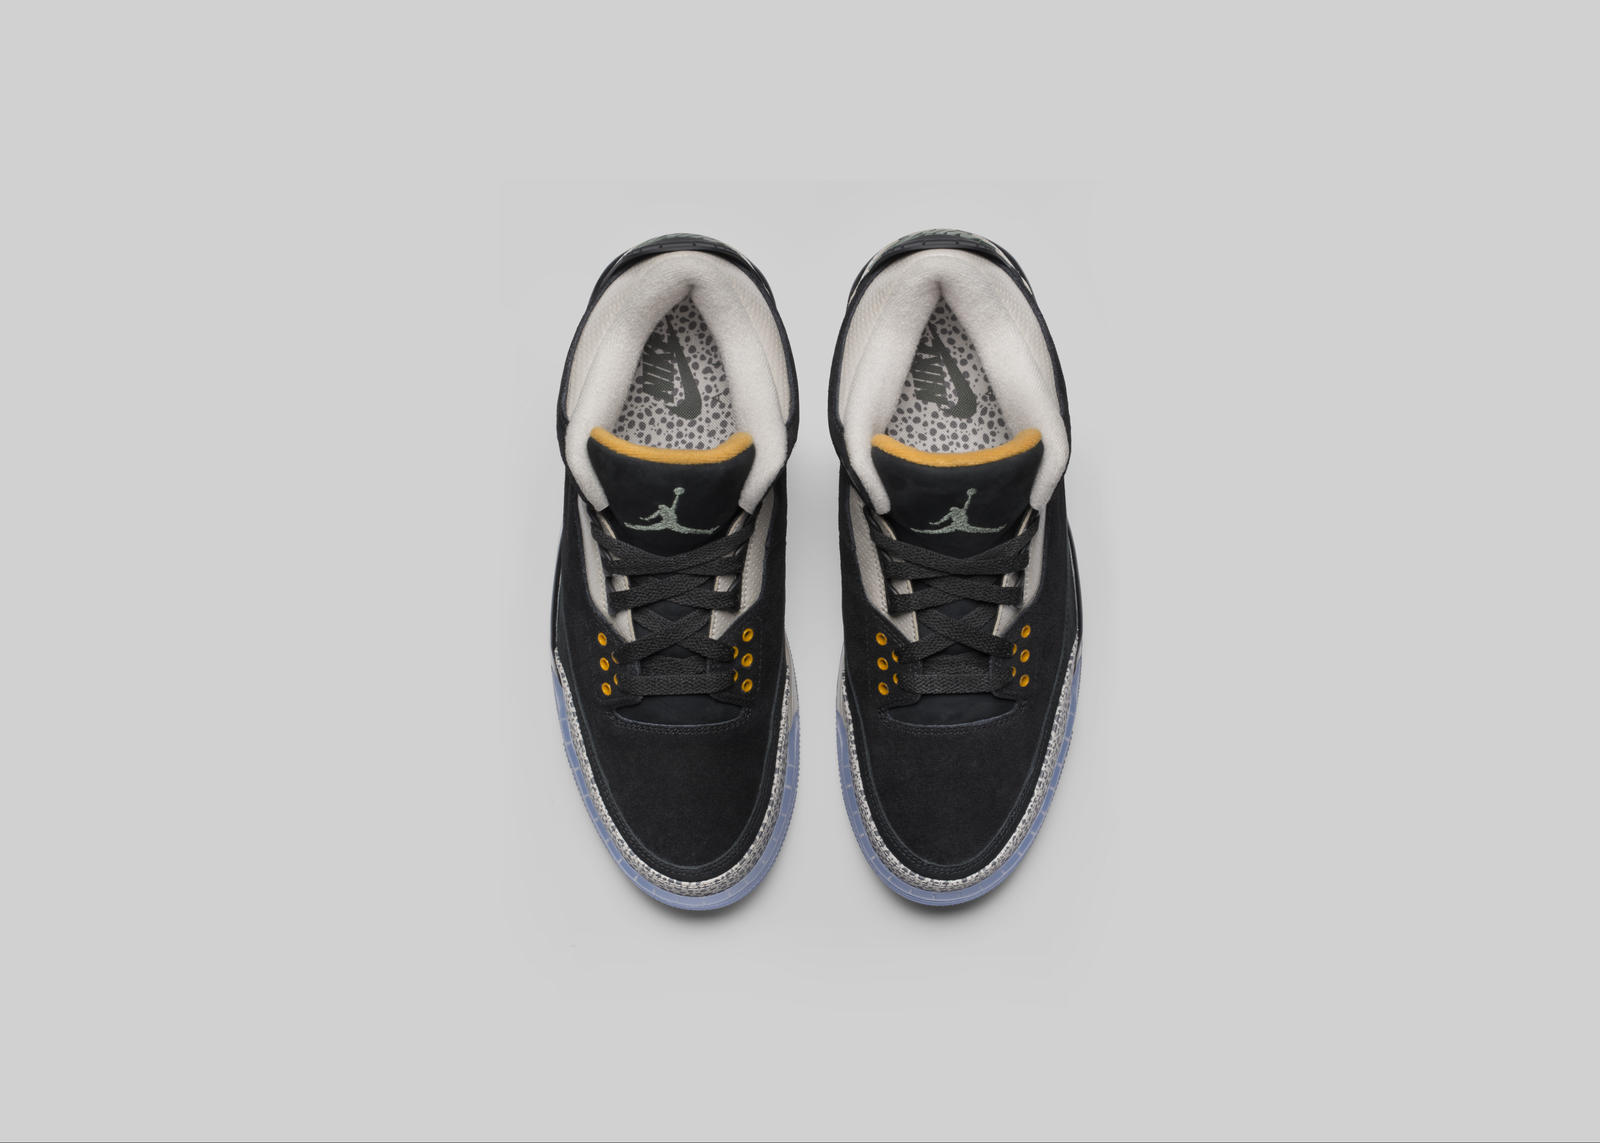 hot sale online 5072c 291b2 I grew up watching Michael Jordan and my first Nike (Jordan) was Air Jordan  1 ...